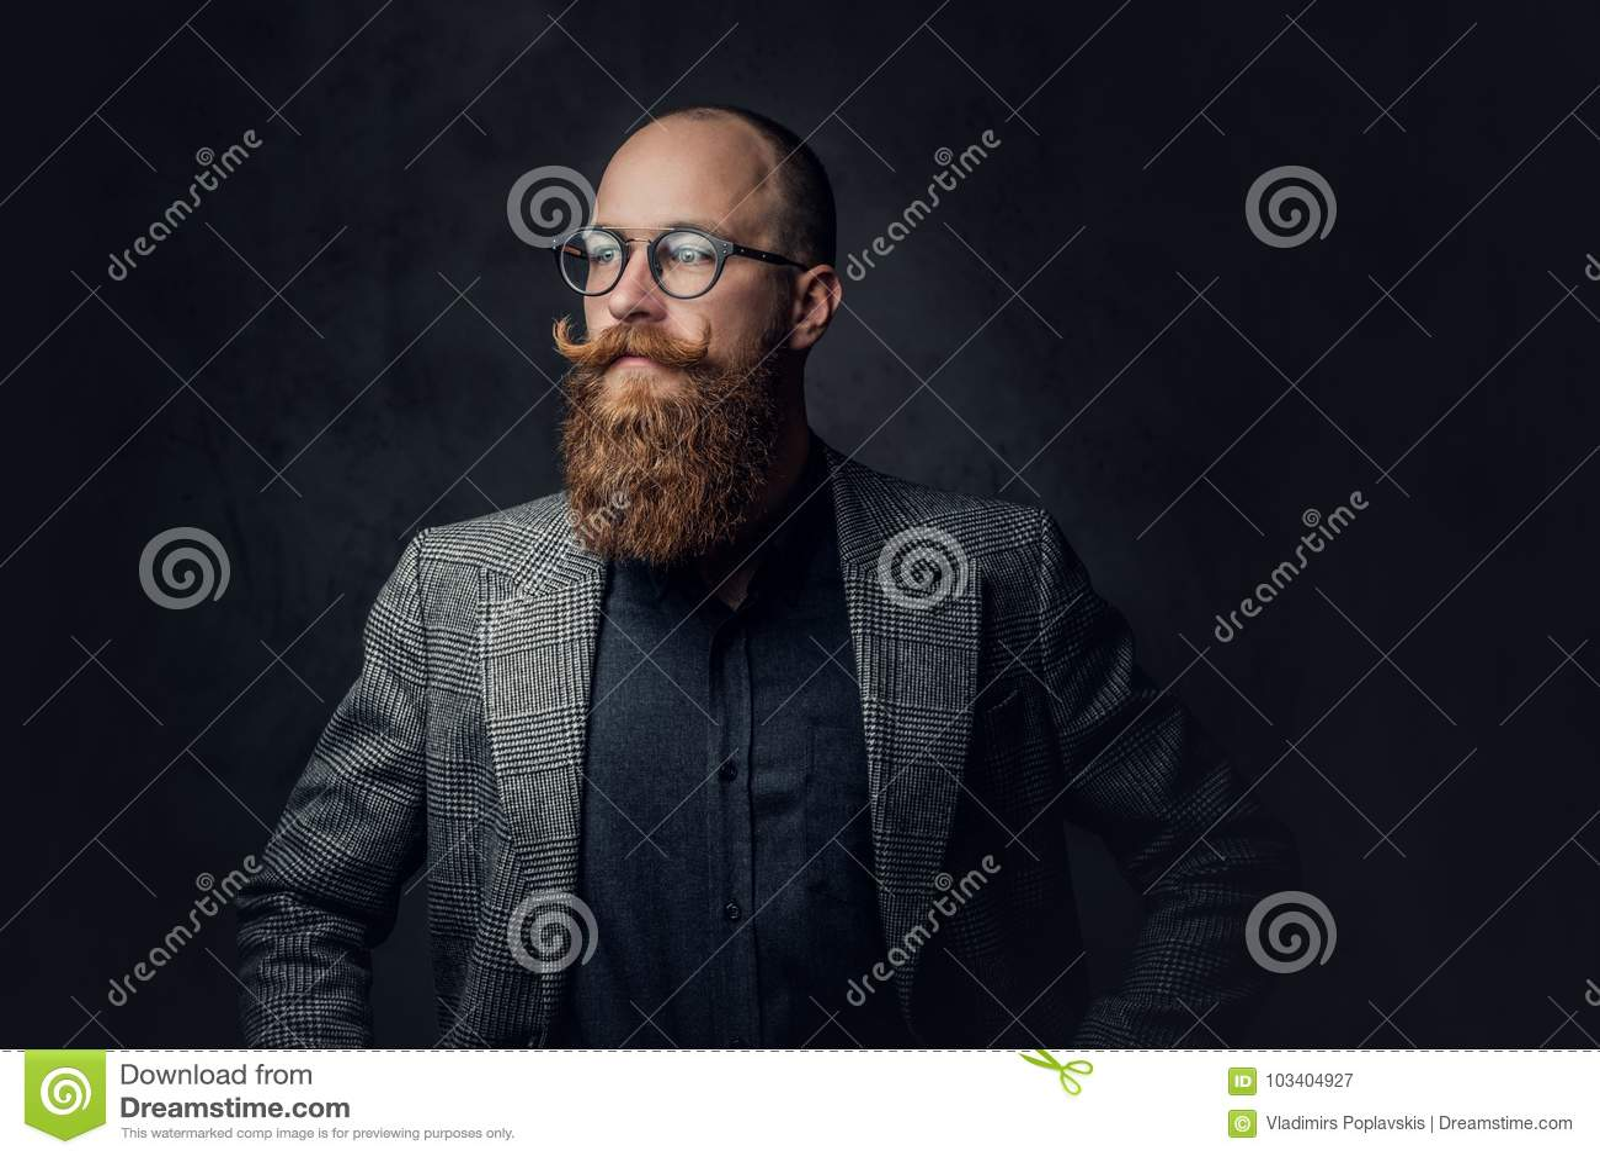 Roodharige gebaard mannetje in een kostuum